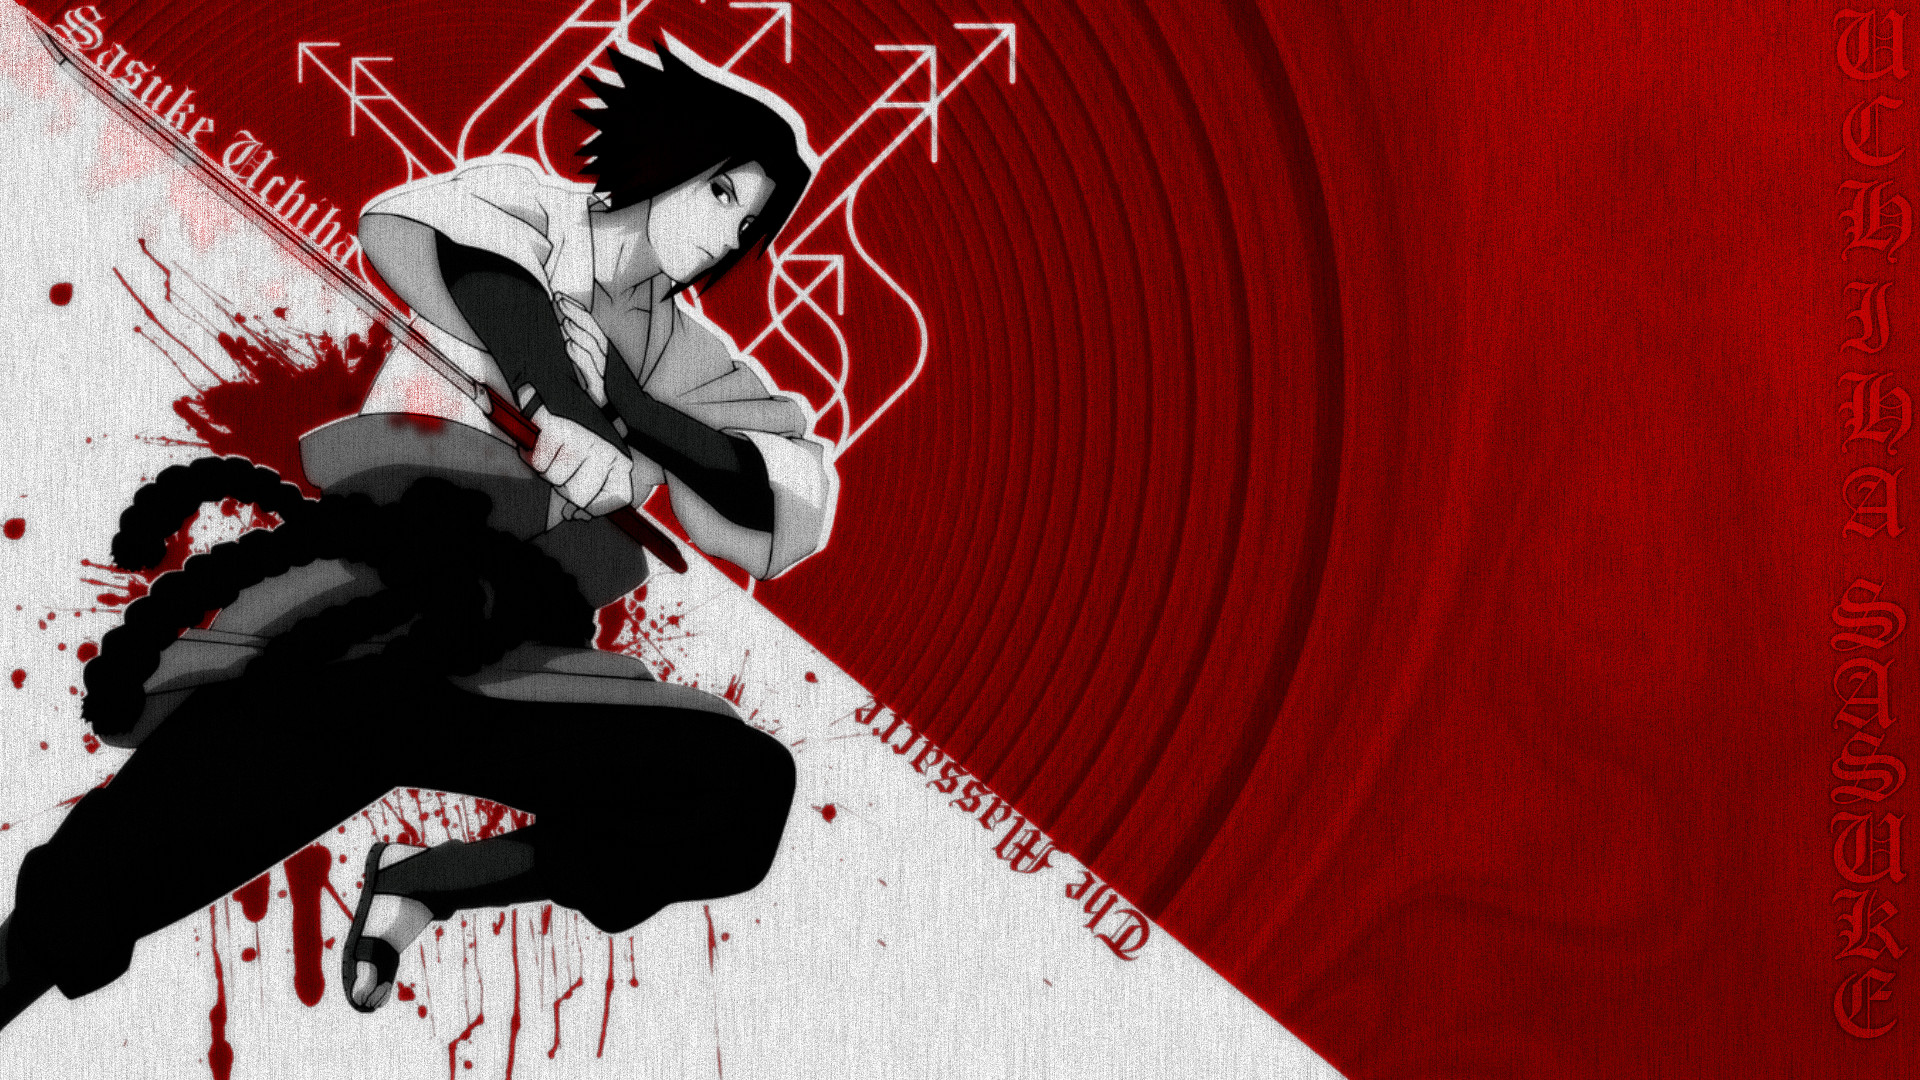 Res: 1920x1080, Sasuke Wallpaper by Mod-a-holic